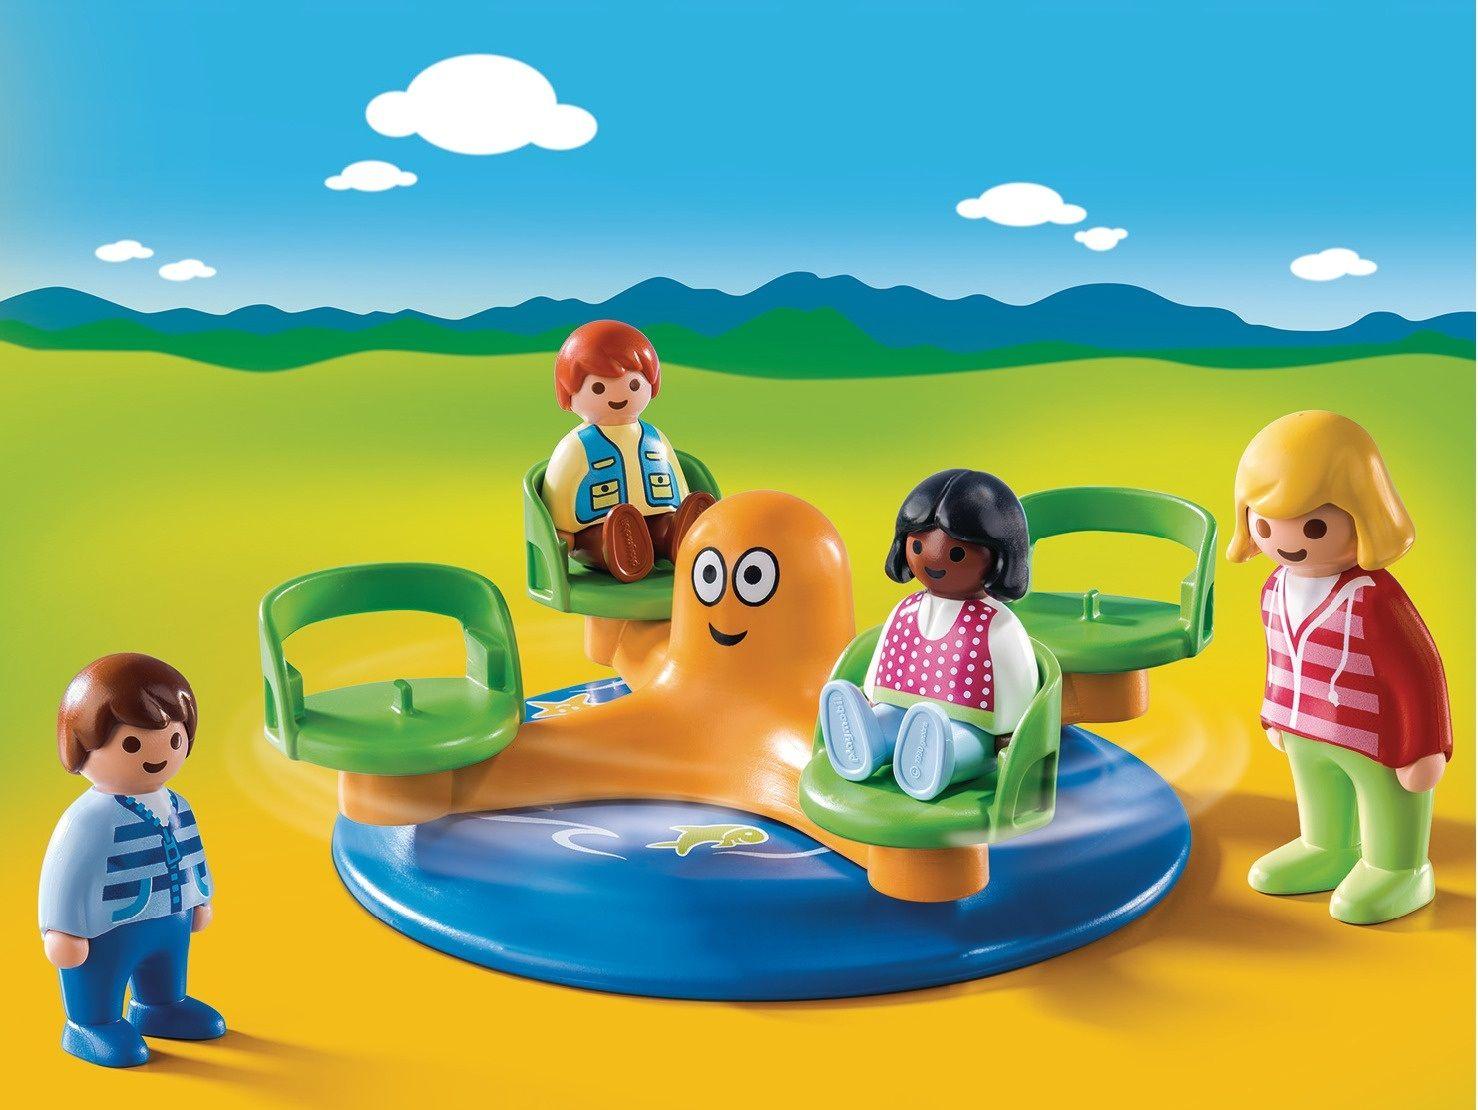 Playmobil 1.2.3 Giostra dei bambini